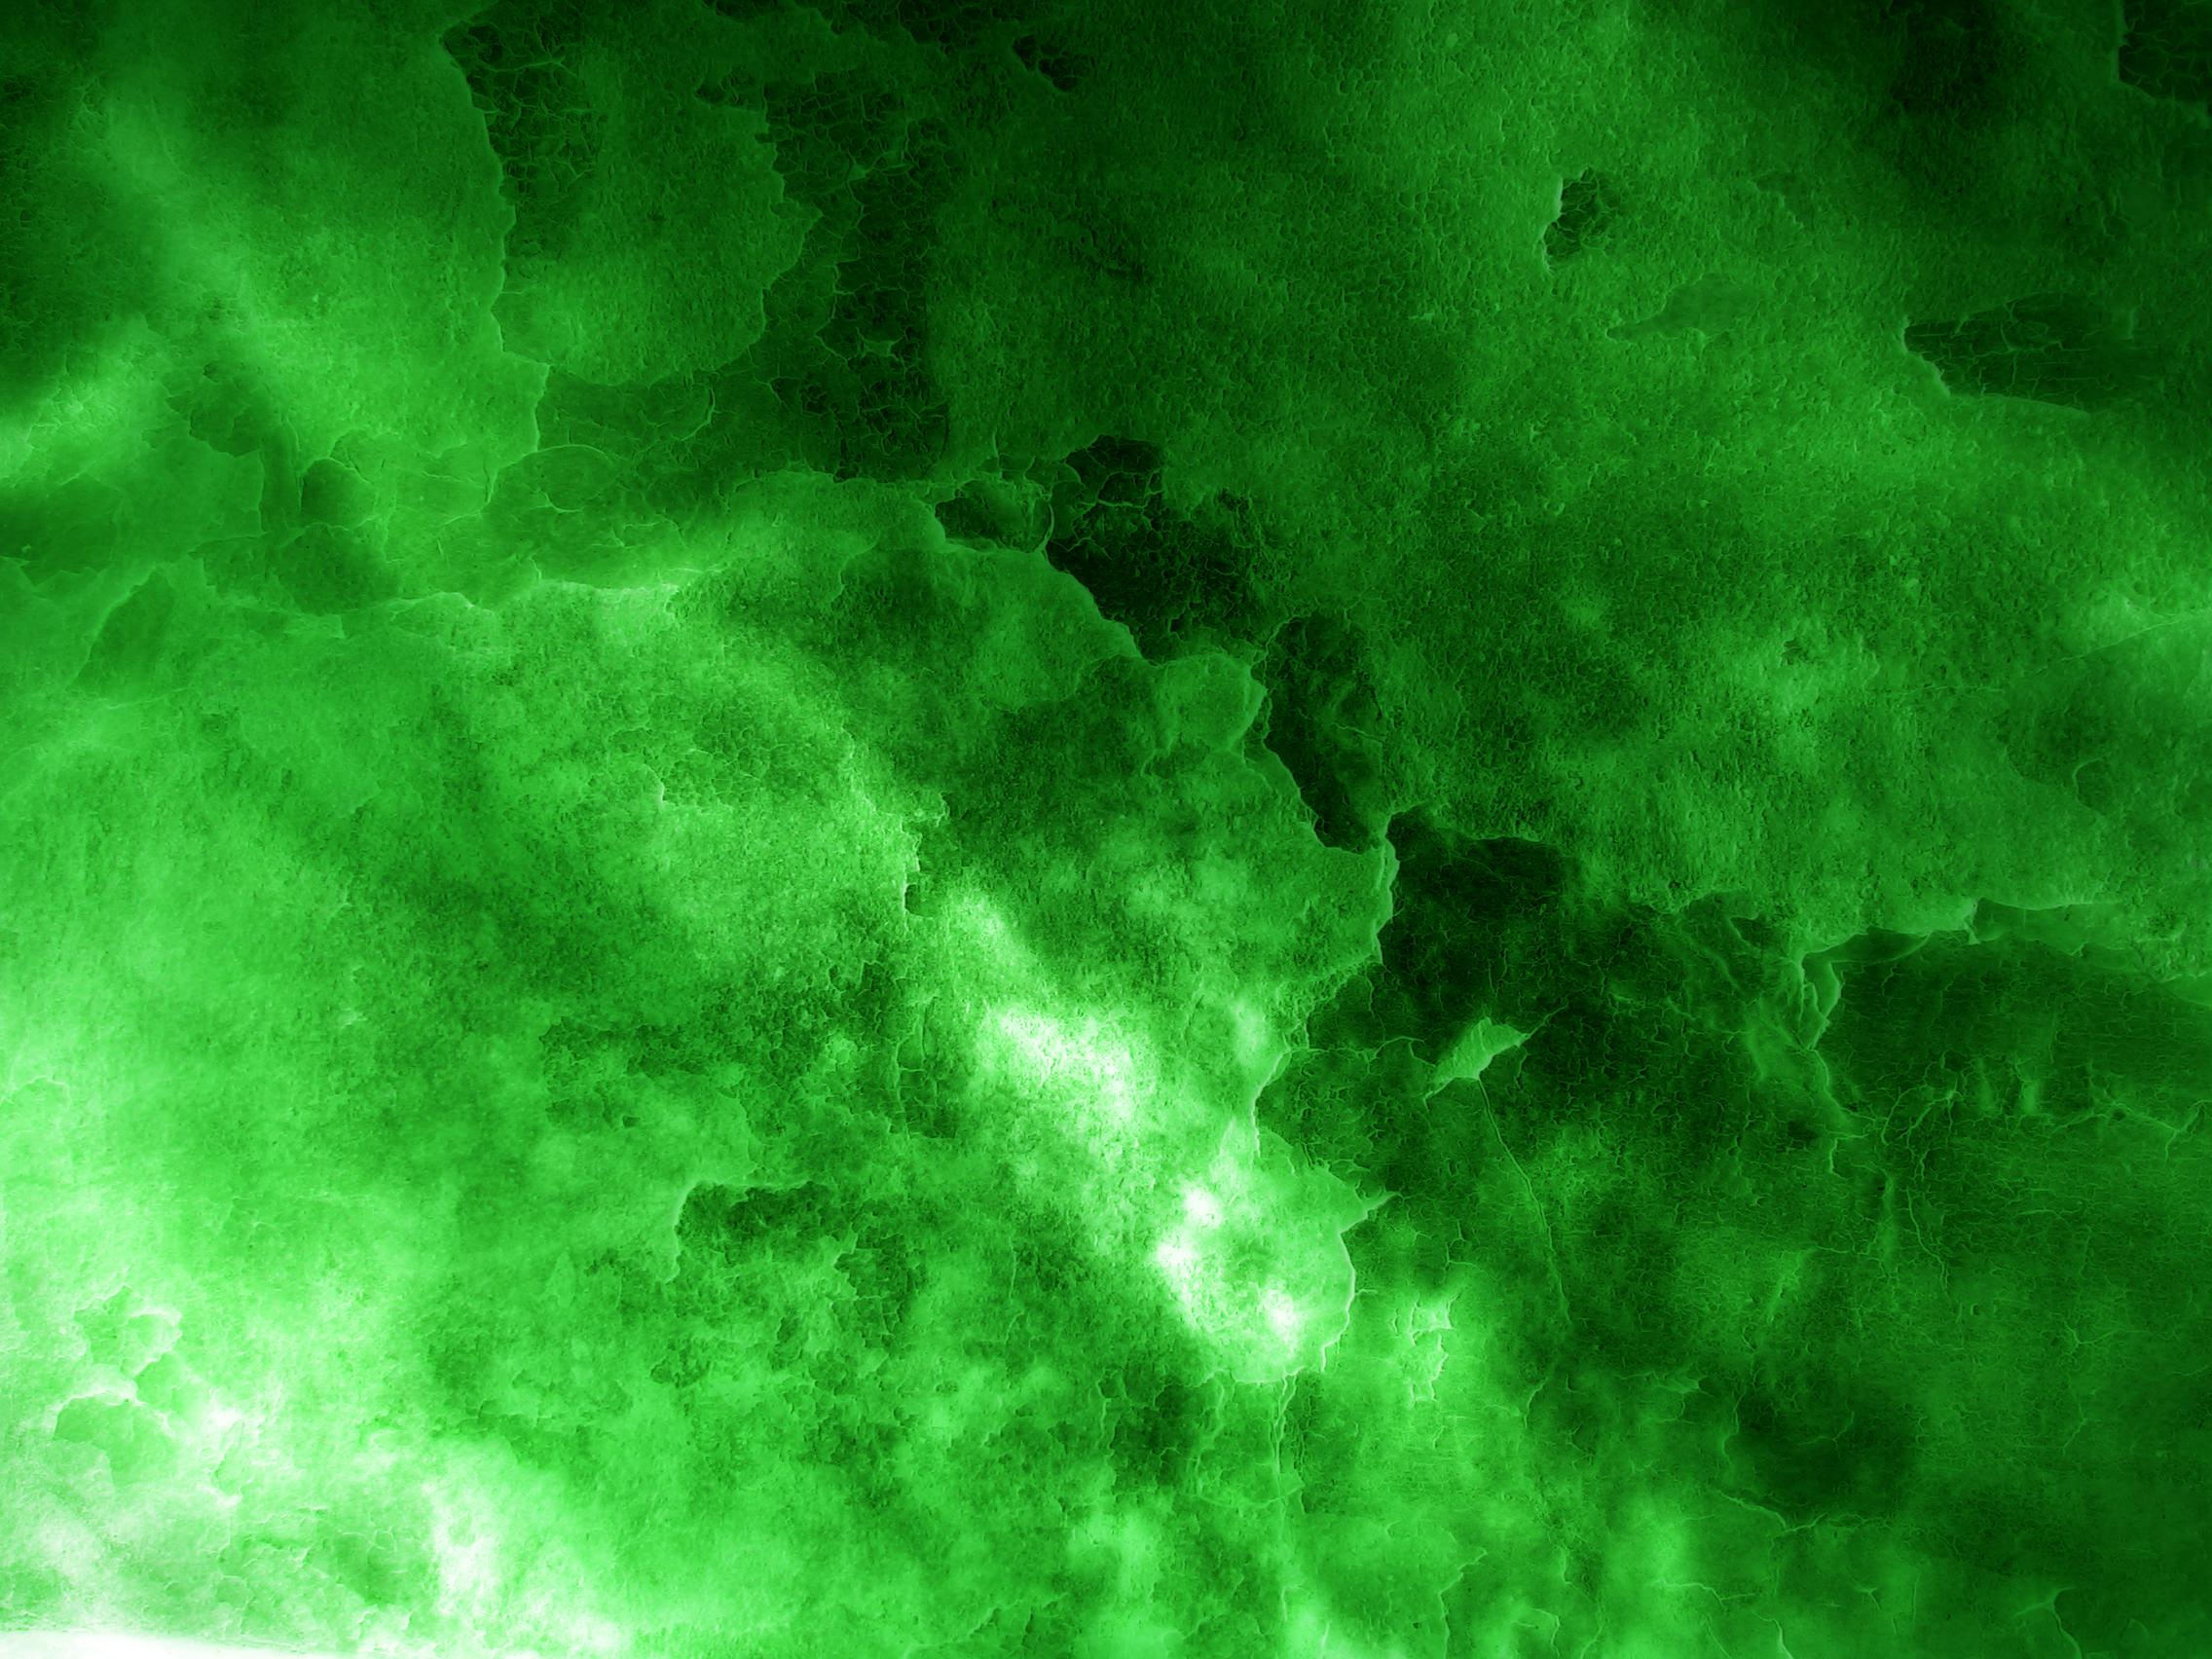 21+ Green Textures, Photoshop Textures, Patterns ...